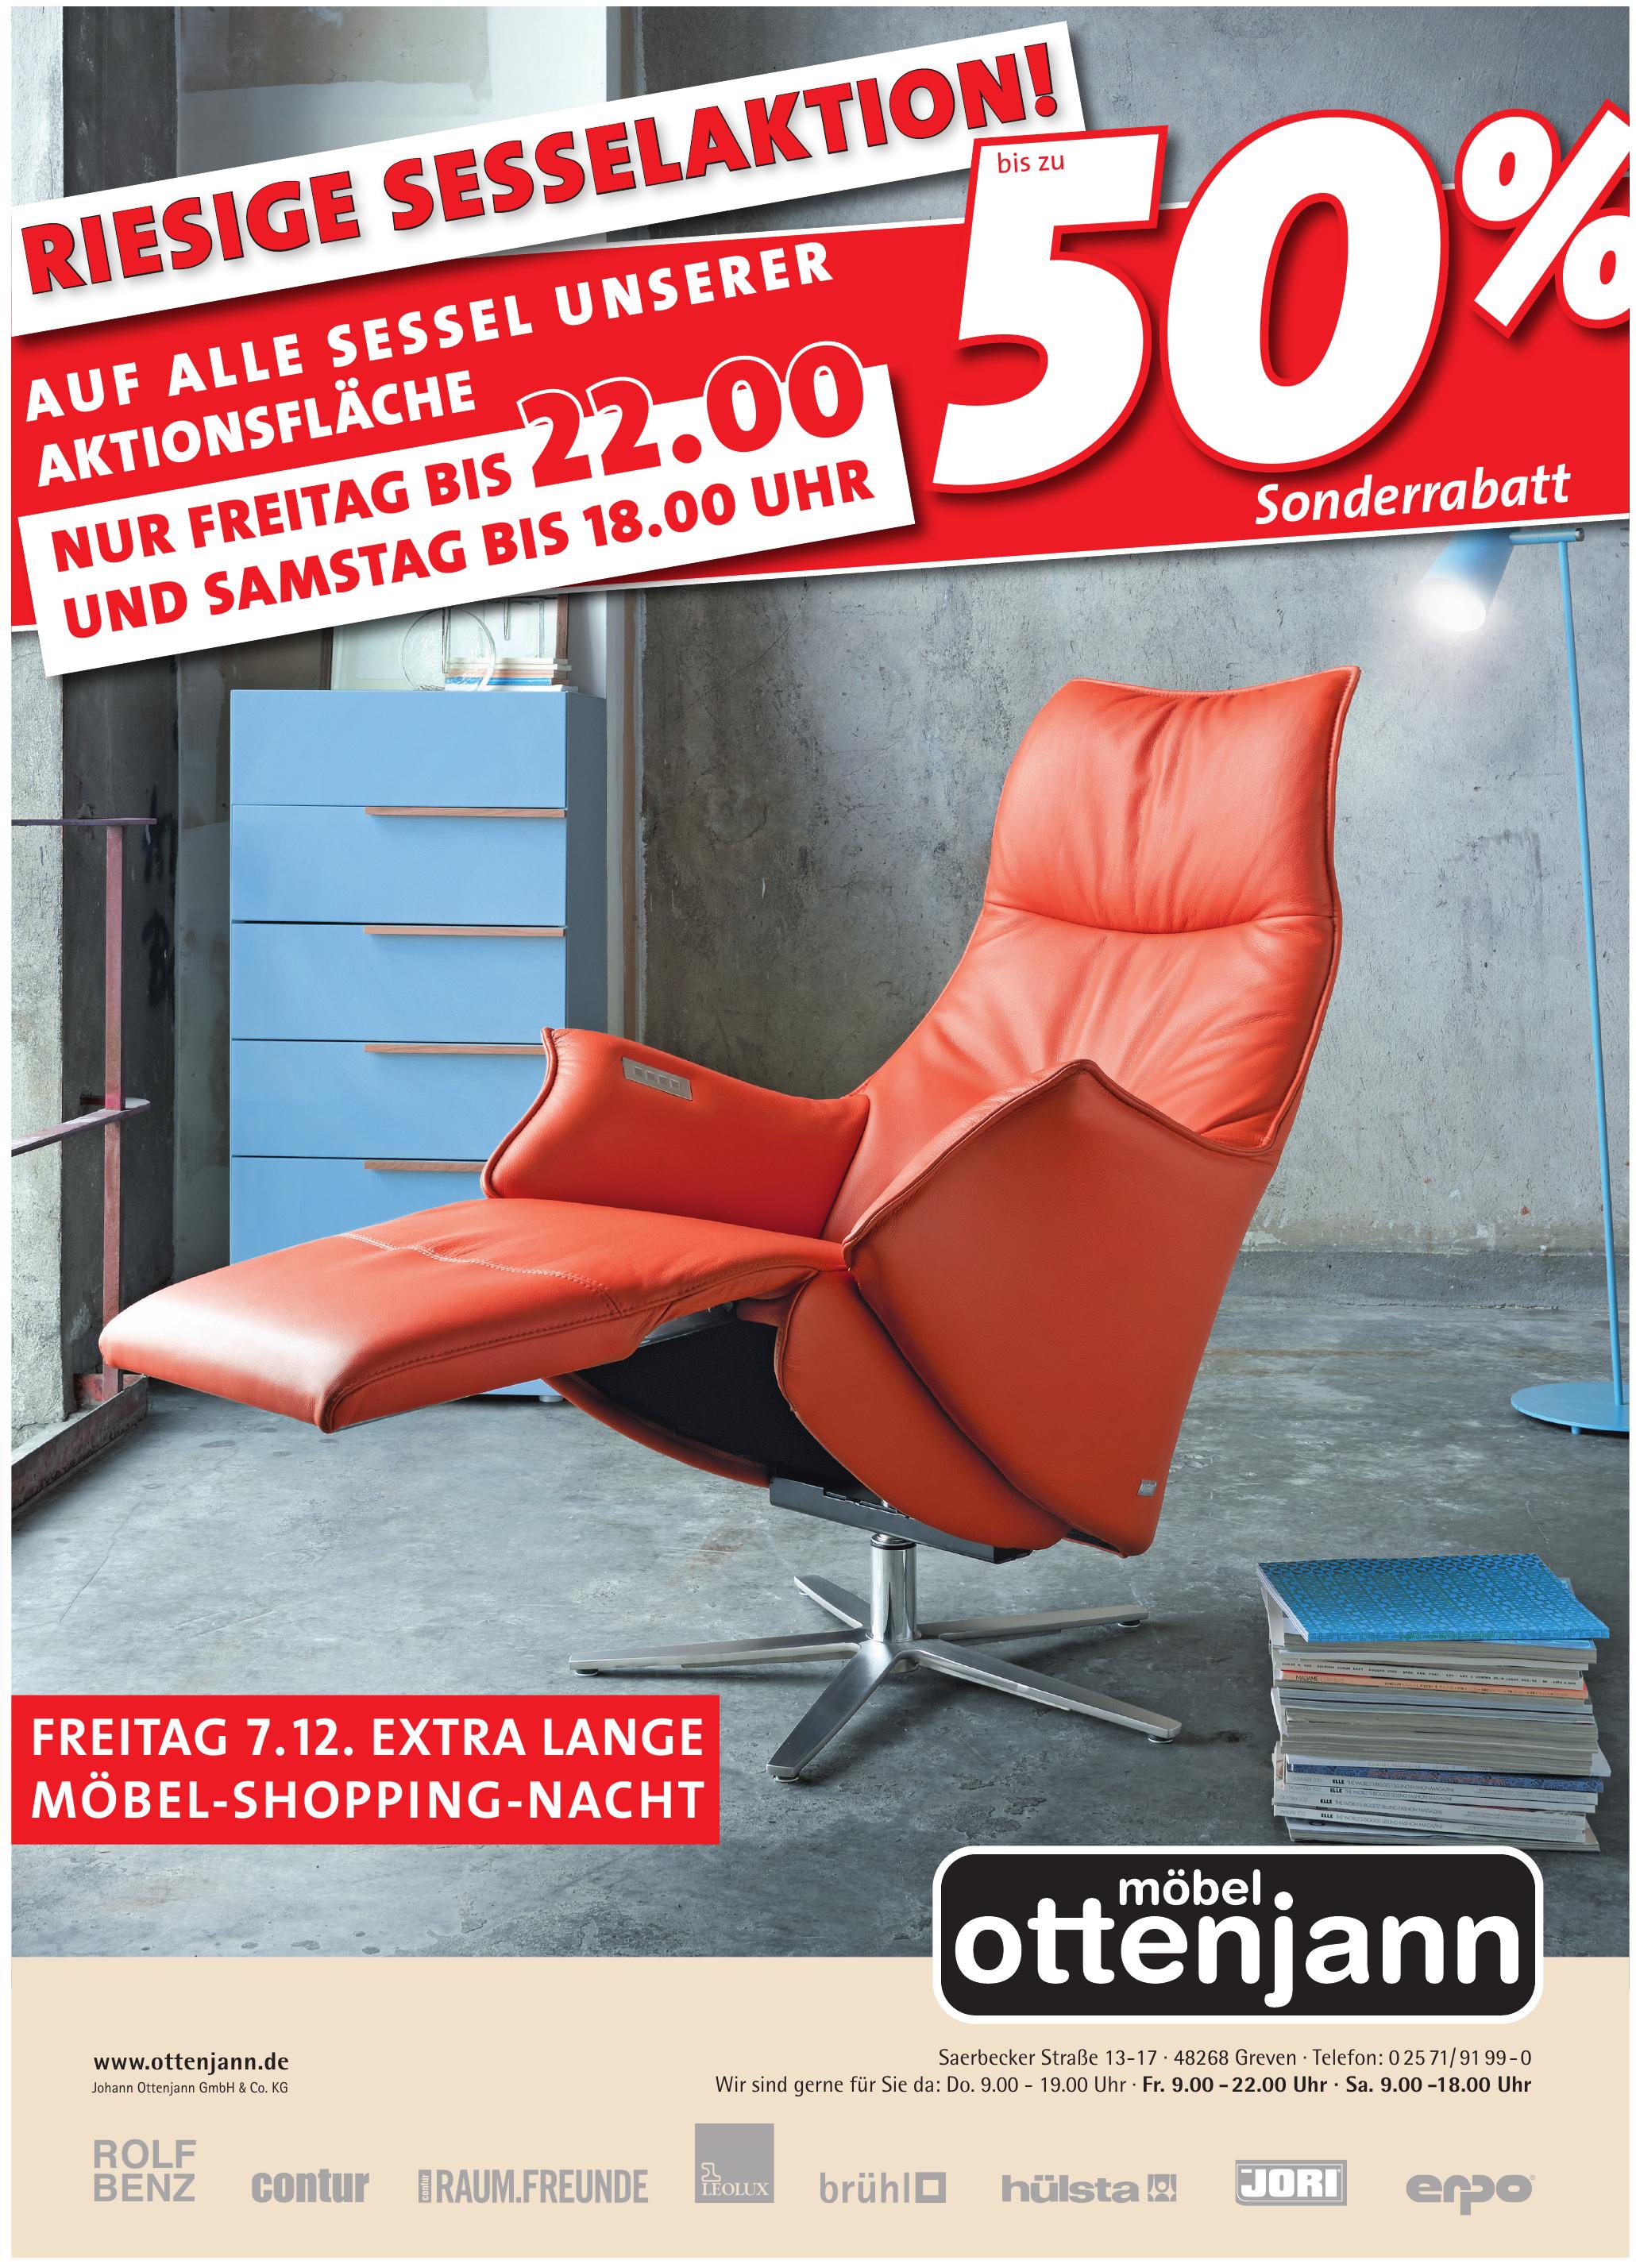 Johann Ottenjann GmbH & Co. KG